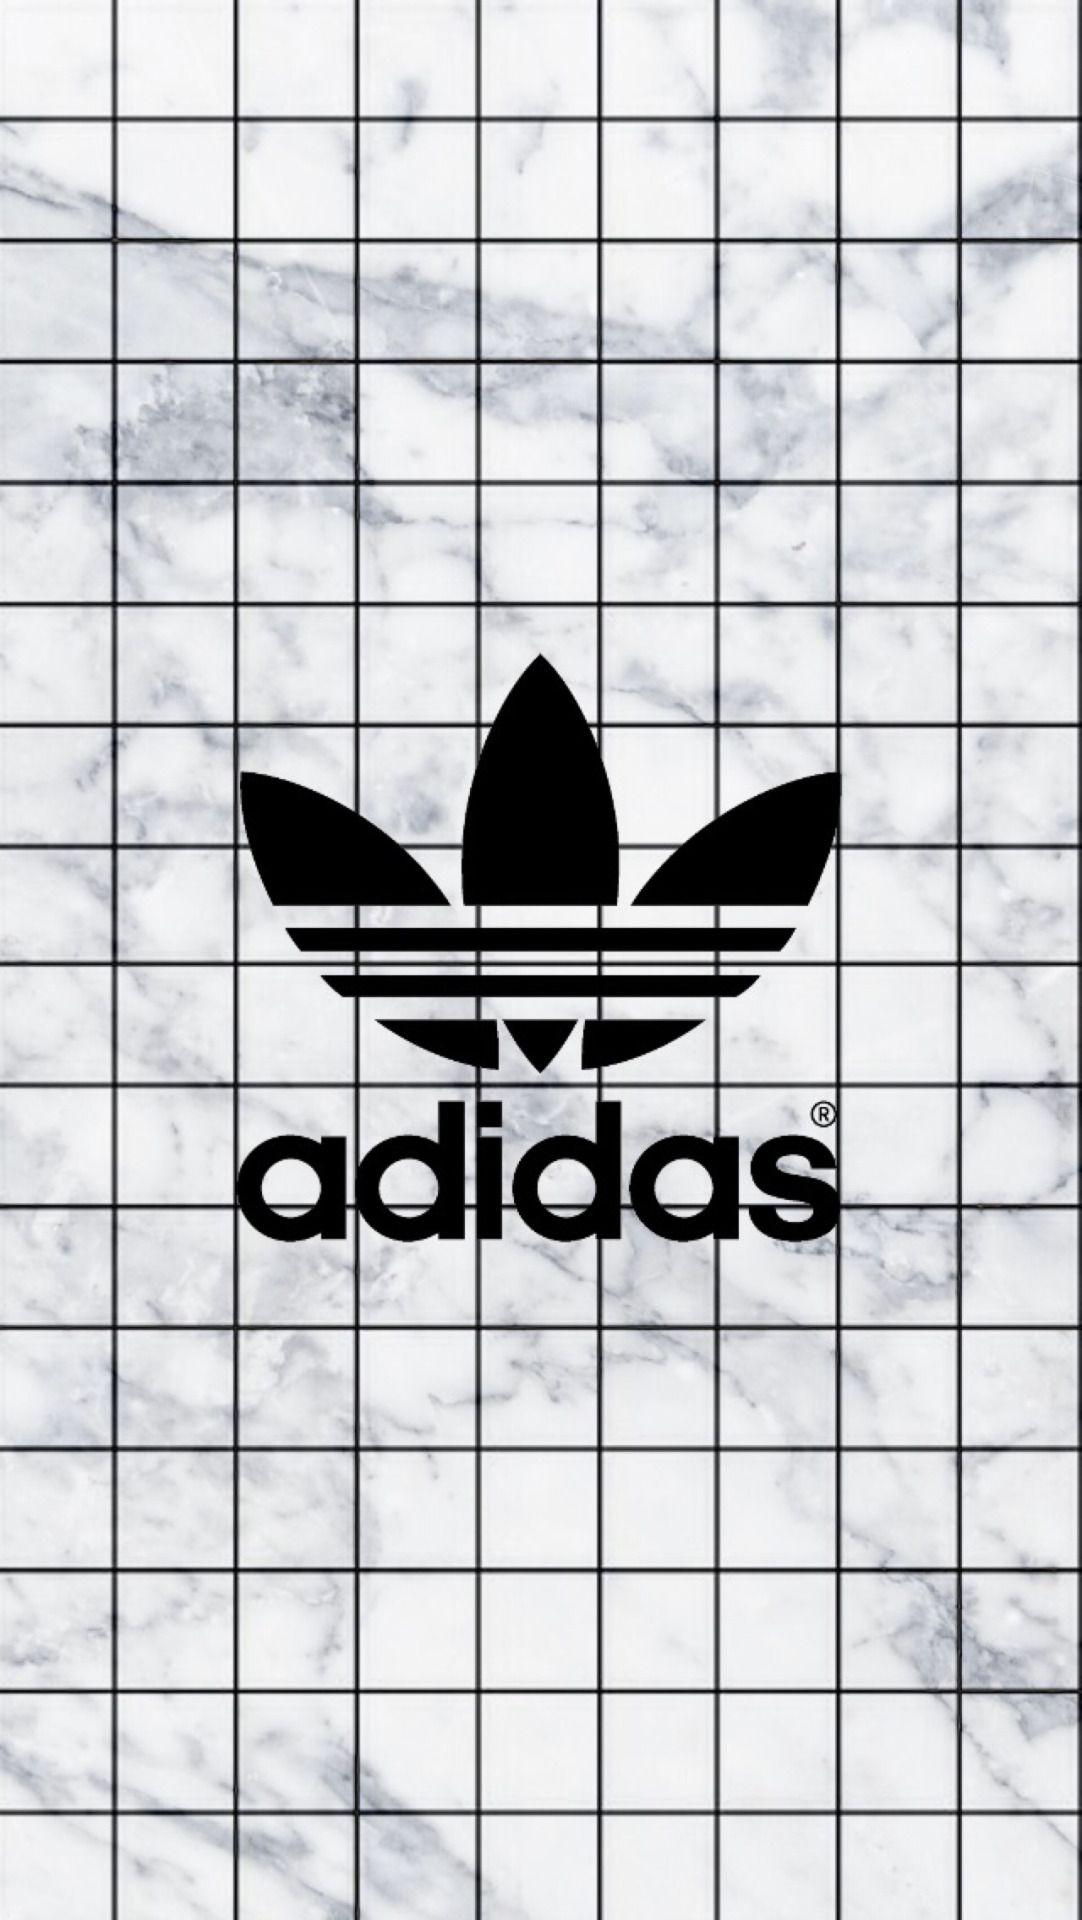 Adidas wallpaper tumblr m s